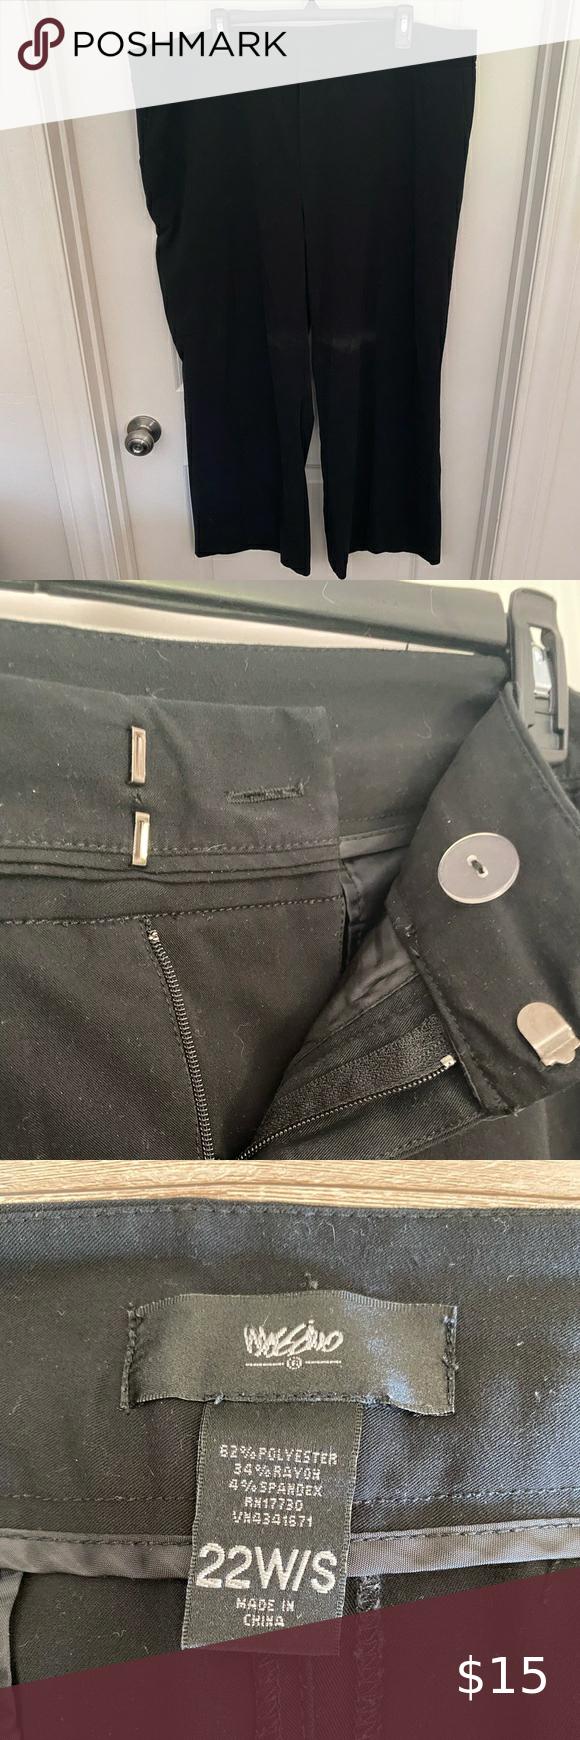 Short Black Dress Pants Mossimo Size 22w Short Black Dress Pants Purchased From Target Short Length I Black Dress Pants Black Short Dress Jumpsuit Trousers [ 1740 x 580 Pixel ]